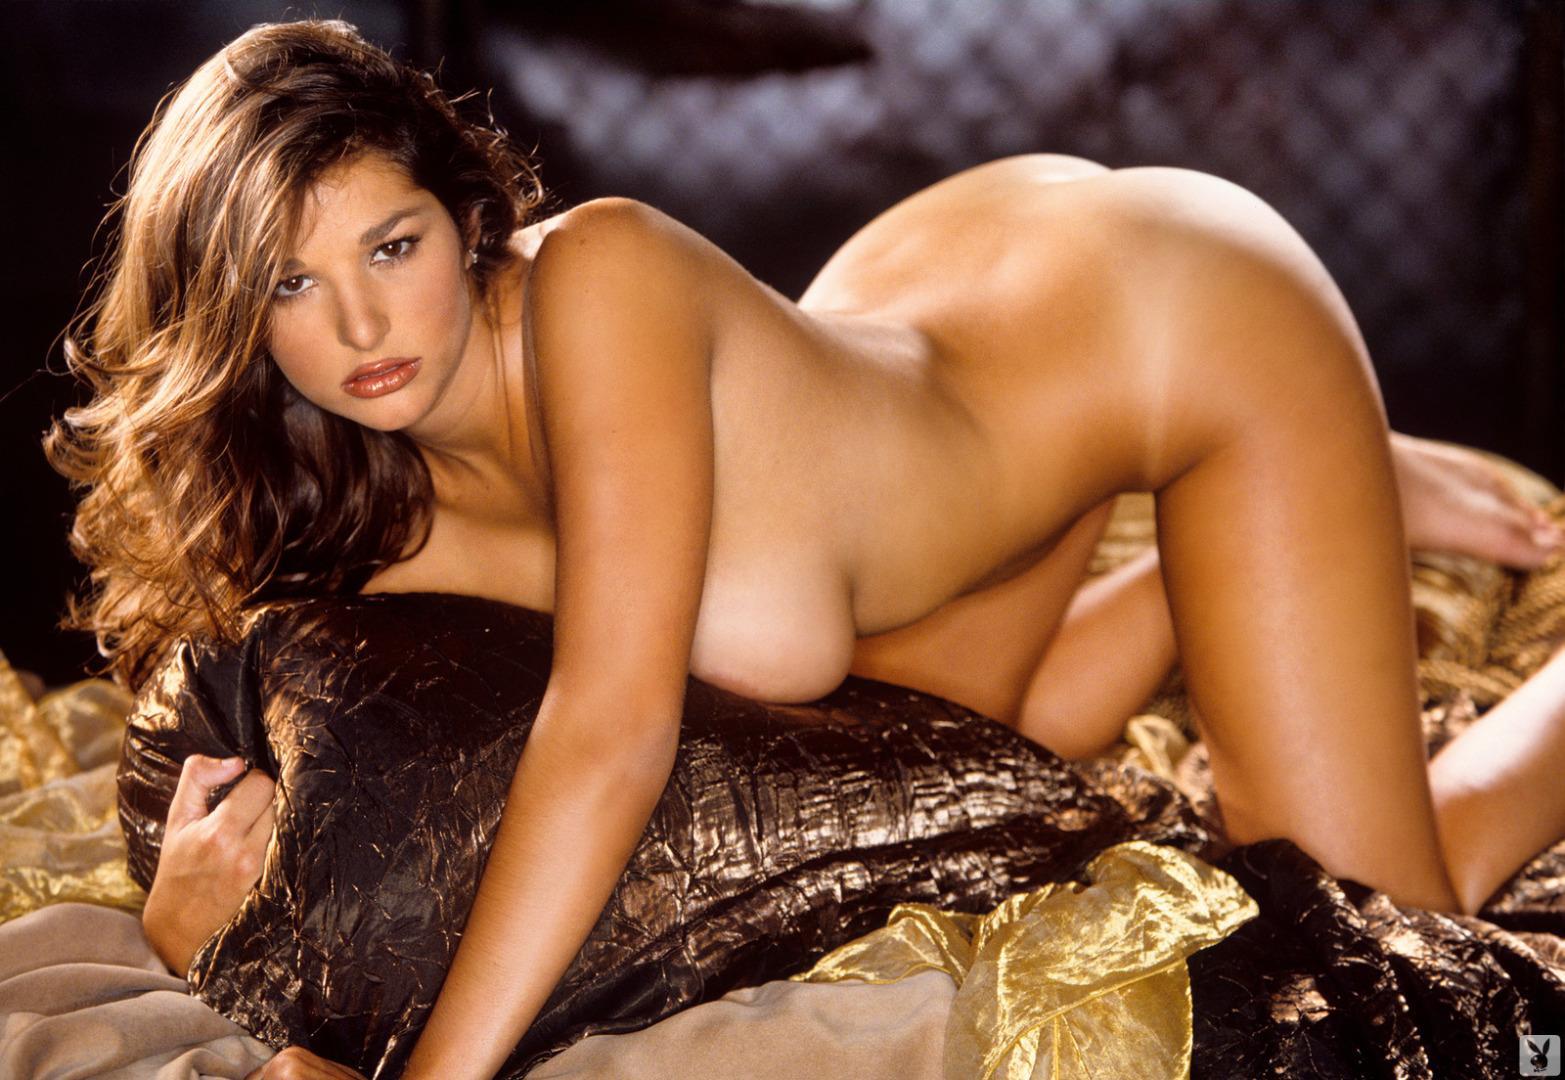 Amber Campisi Playboy Playmates